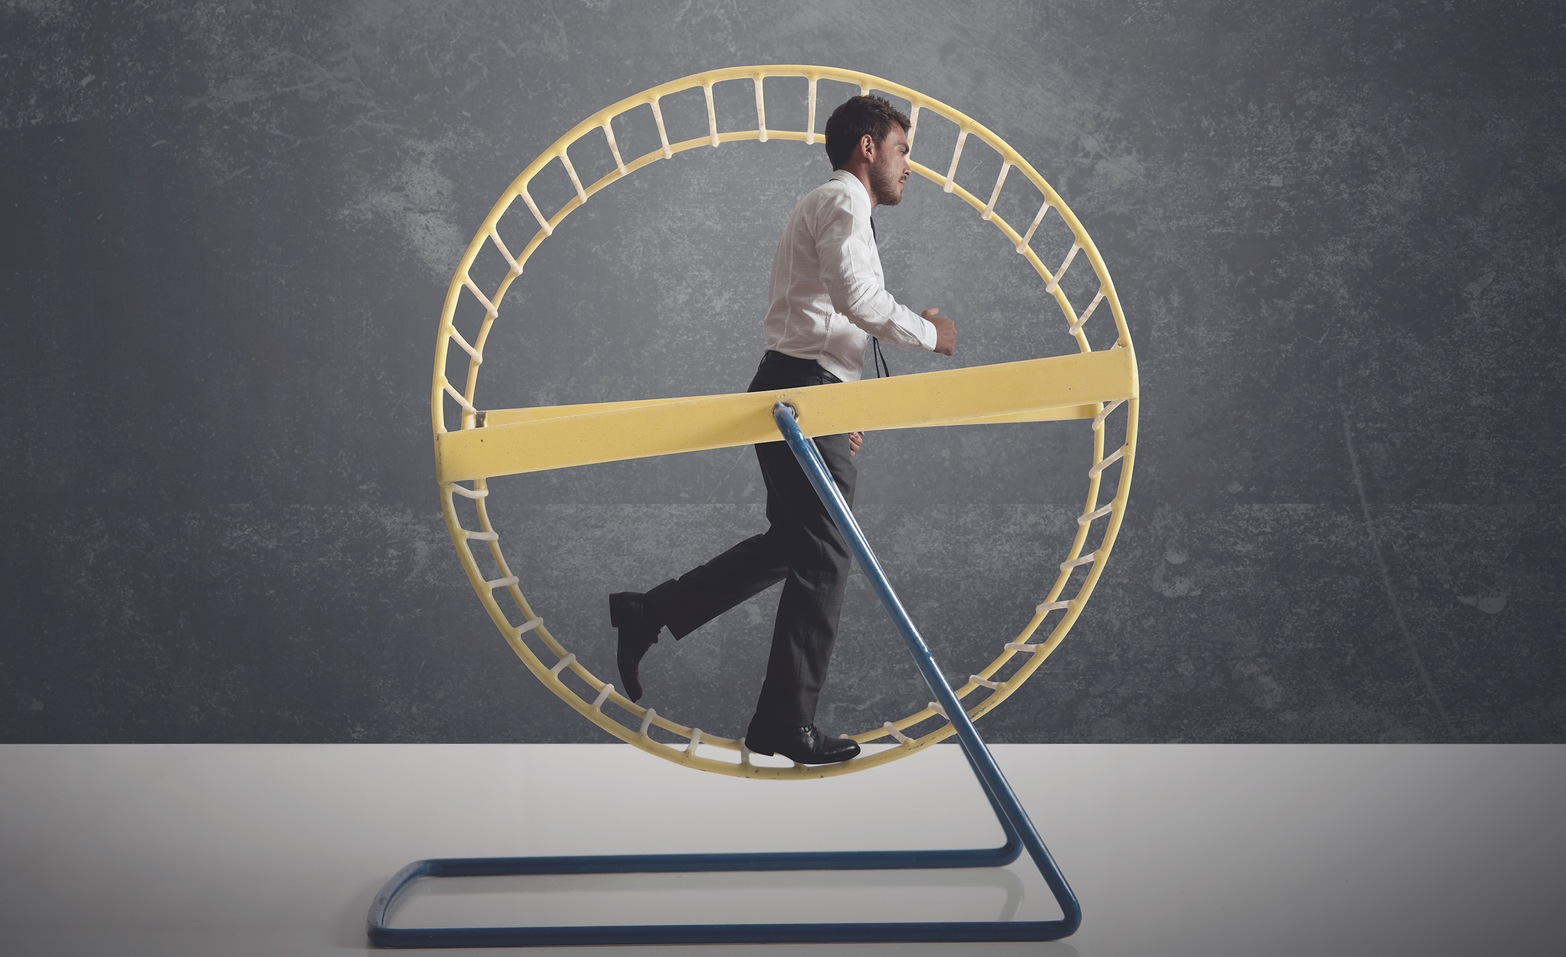 man_gerbil_wheel.jpg